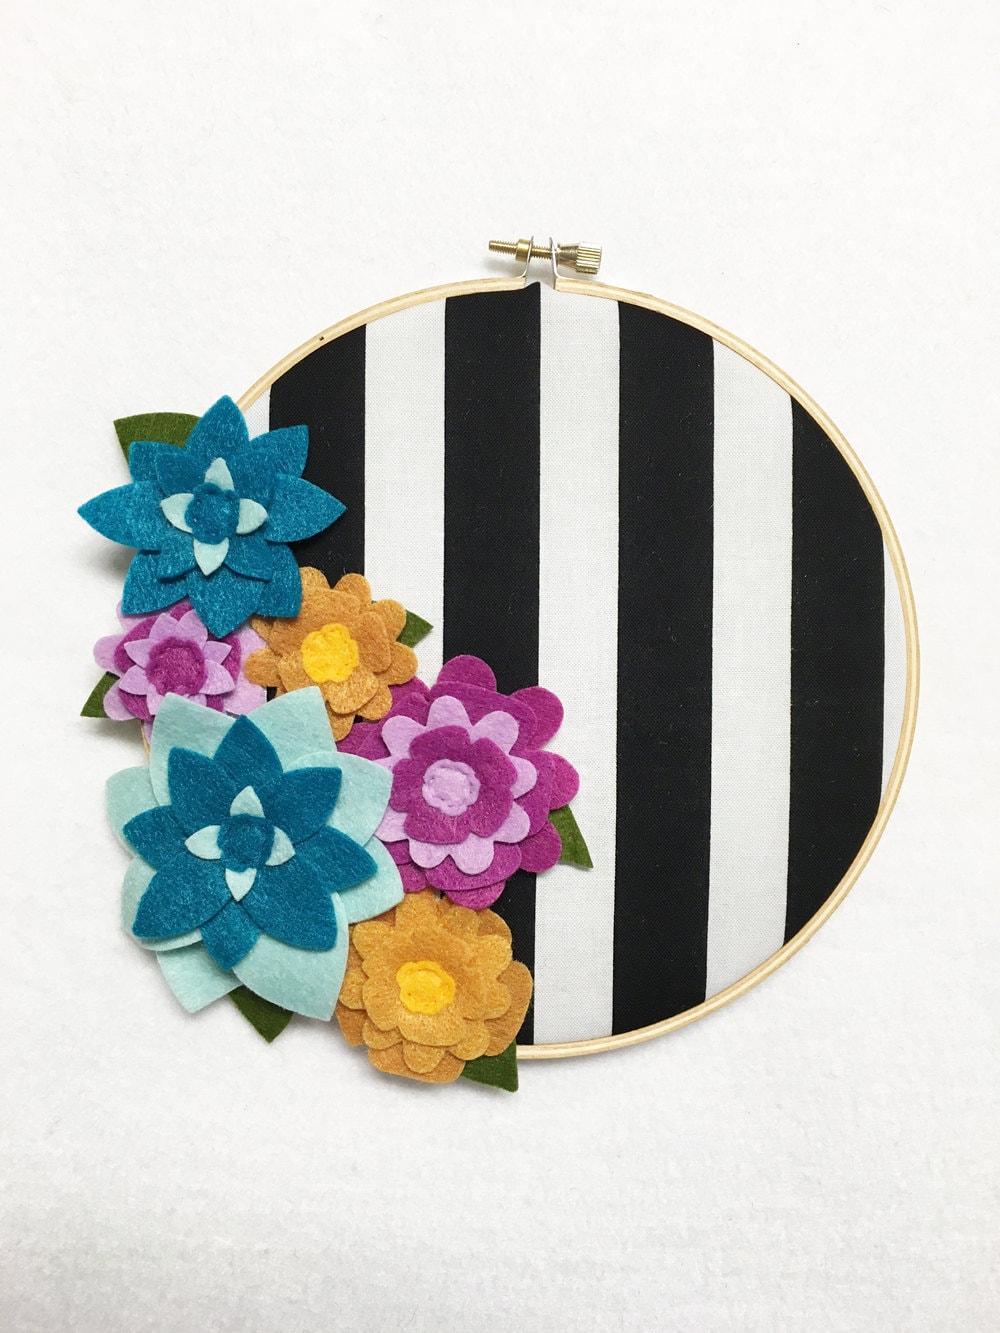 Flower Wall Art, Embroidery Hoop Art, Bold Stripes, Nursery Decoration, Floral  Wall Decor, Hoop Wall Hanging, Felt Flower Hoop